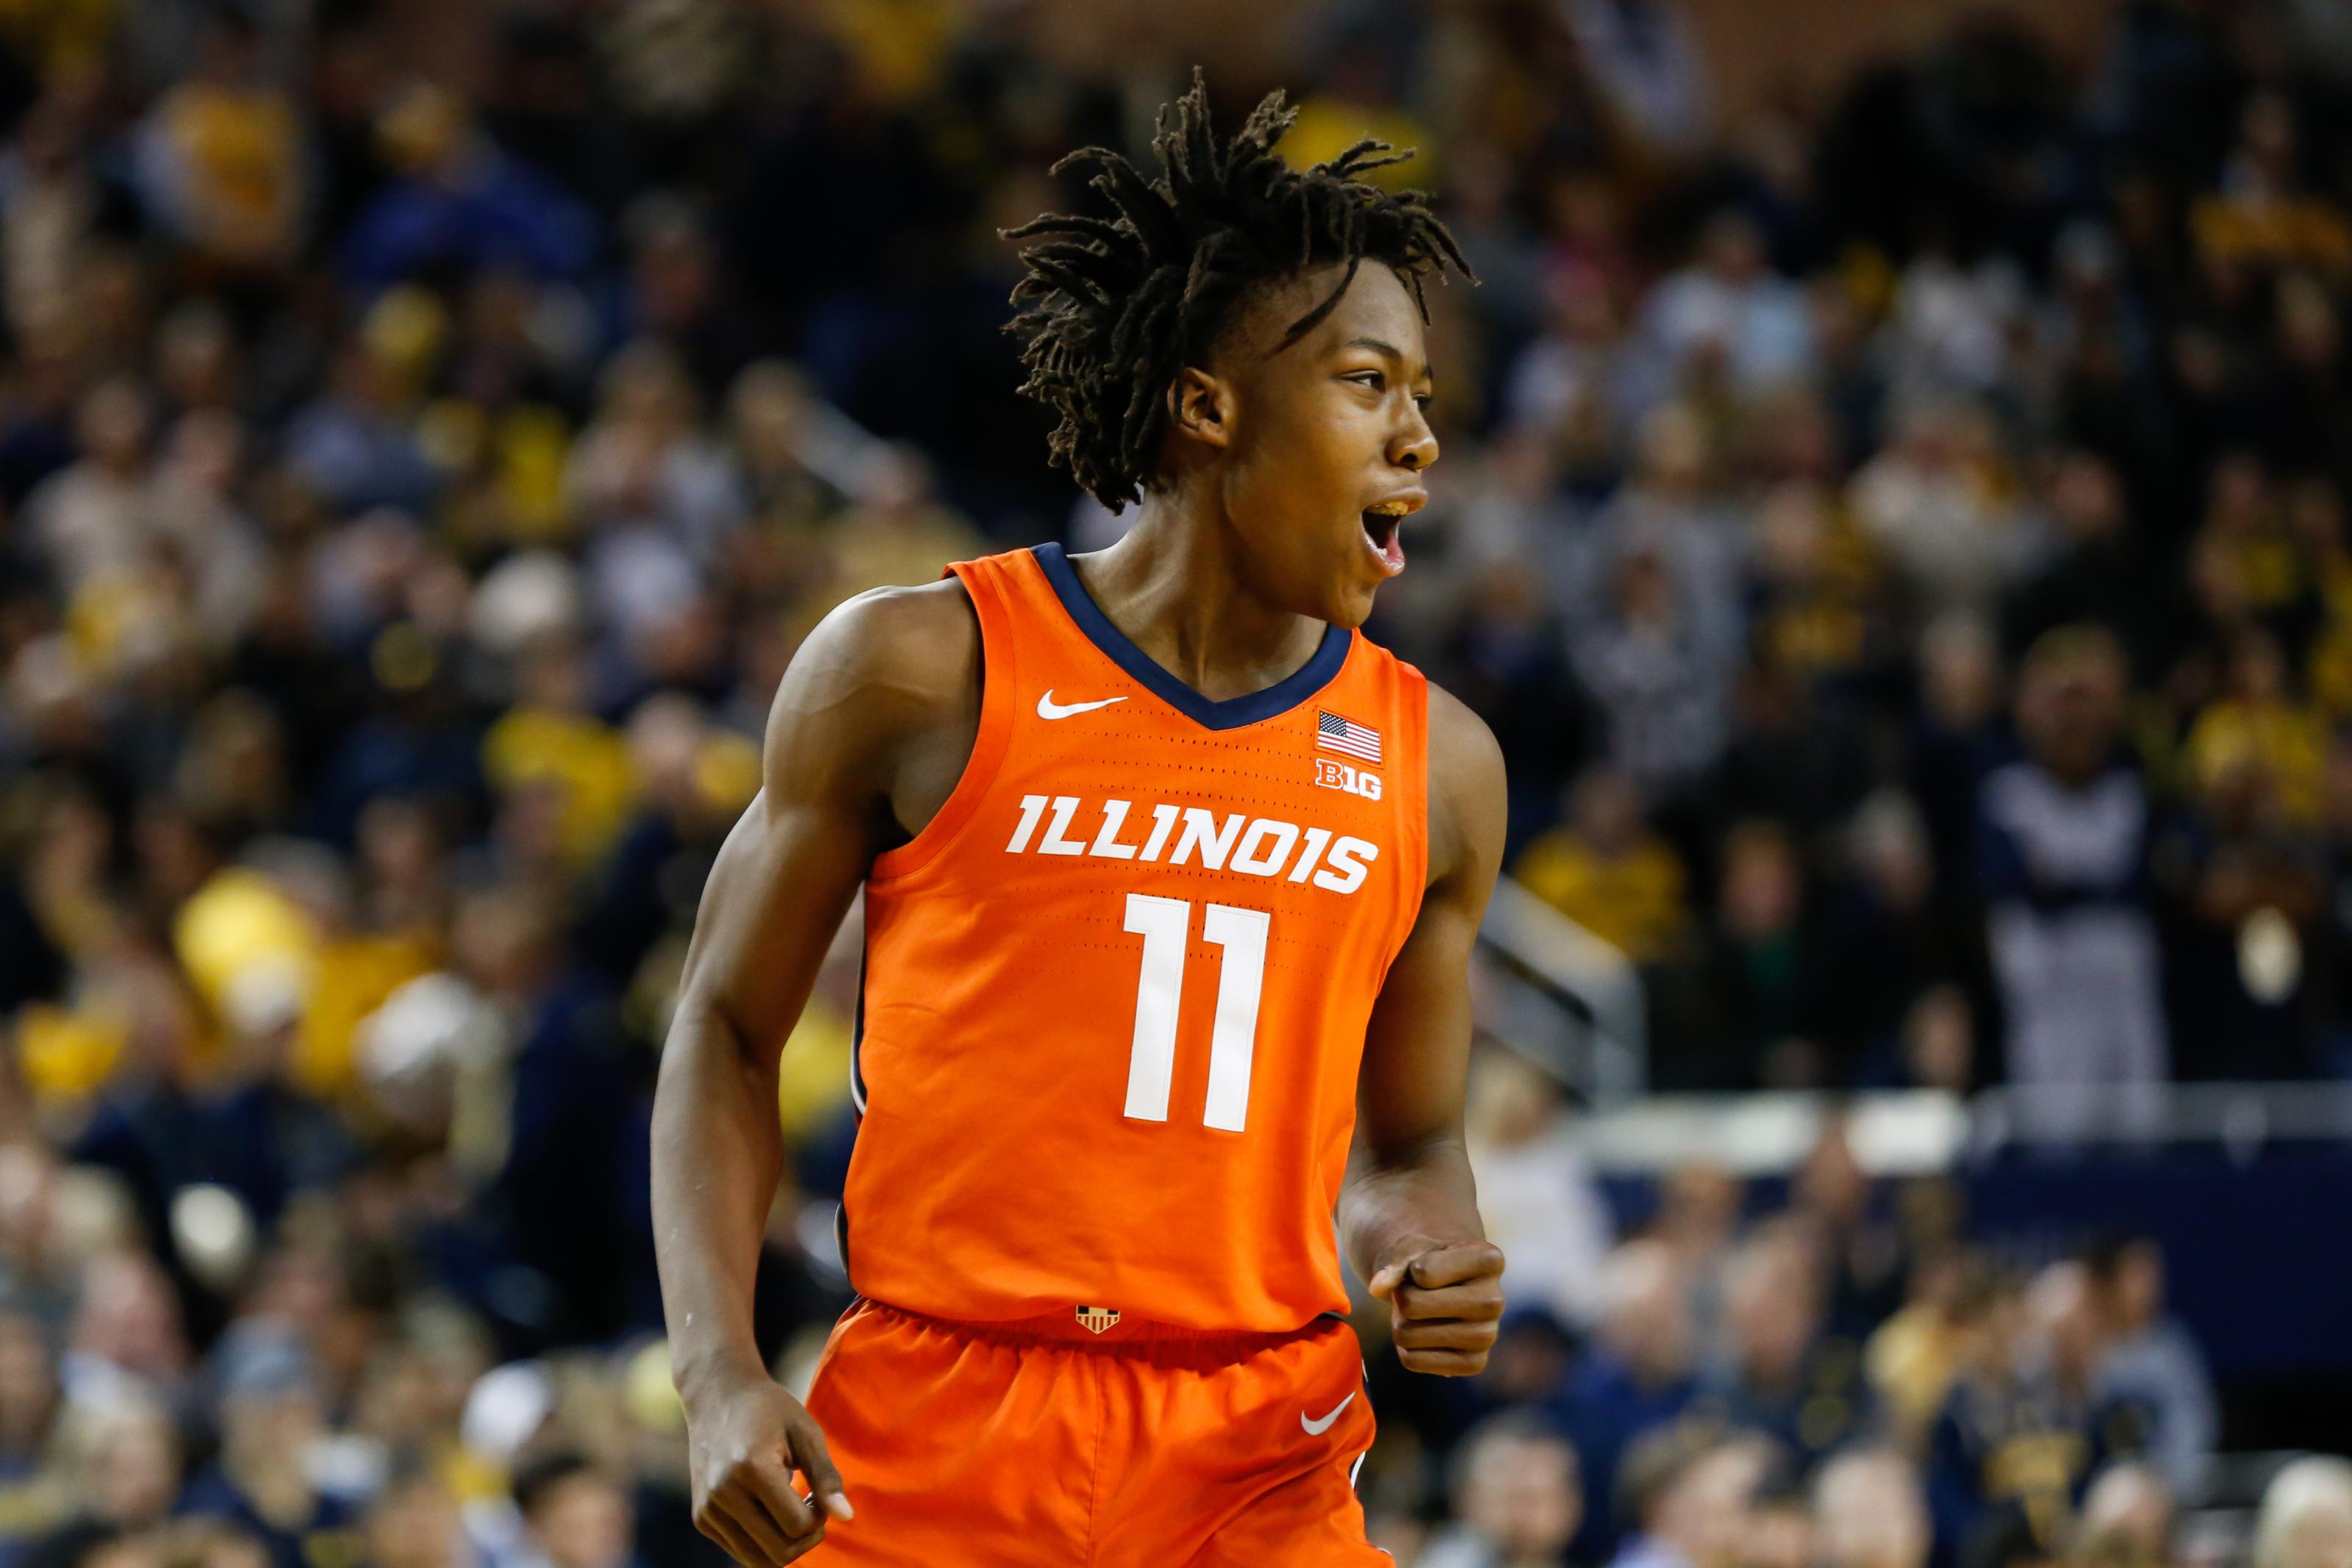 Illinois Basketball: How the return of Ayo Dosunmu helps the Illini